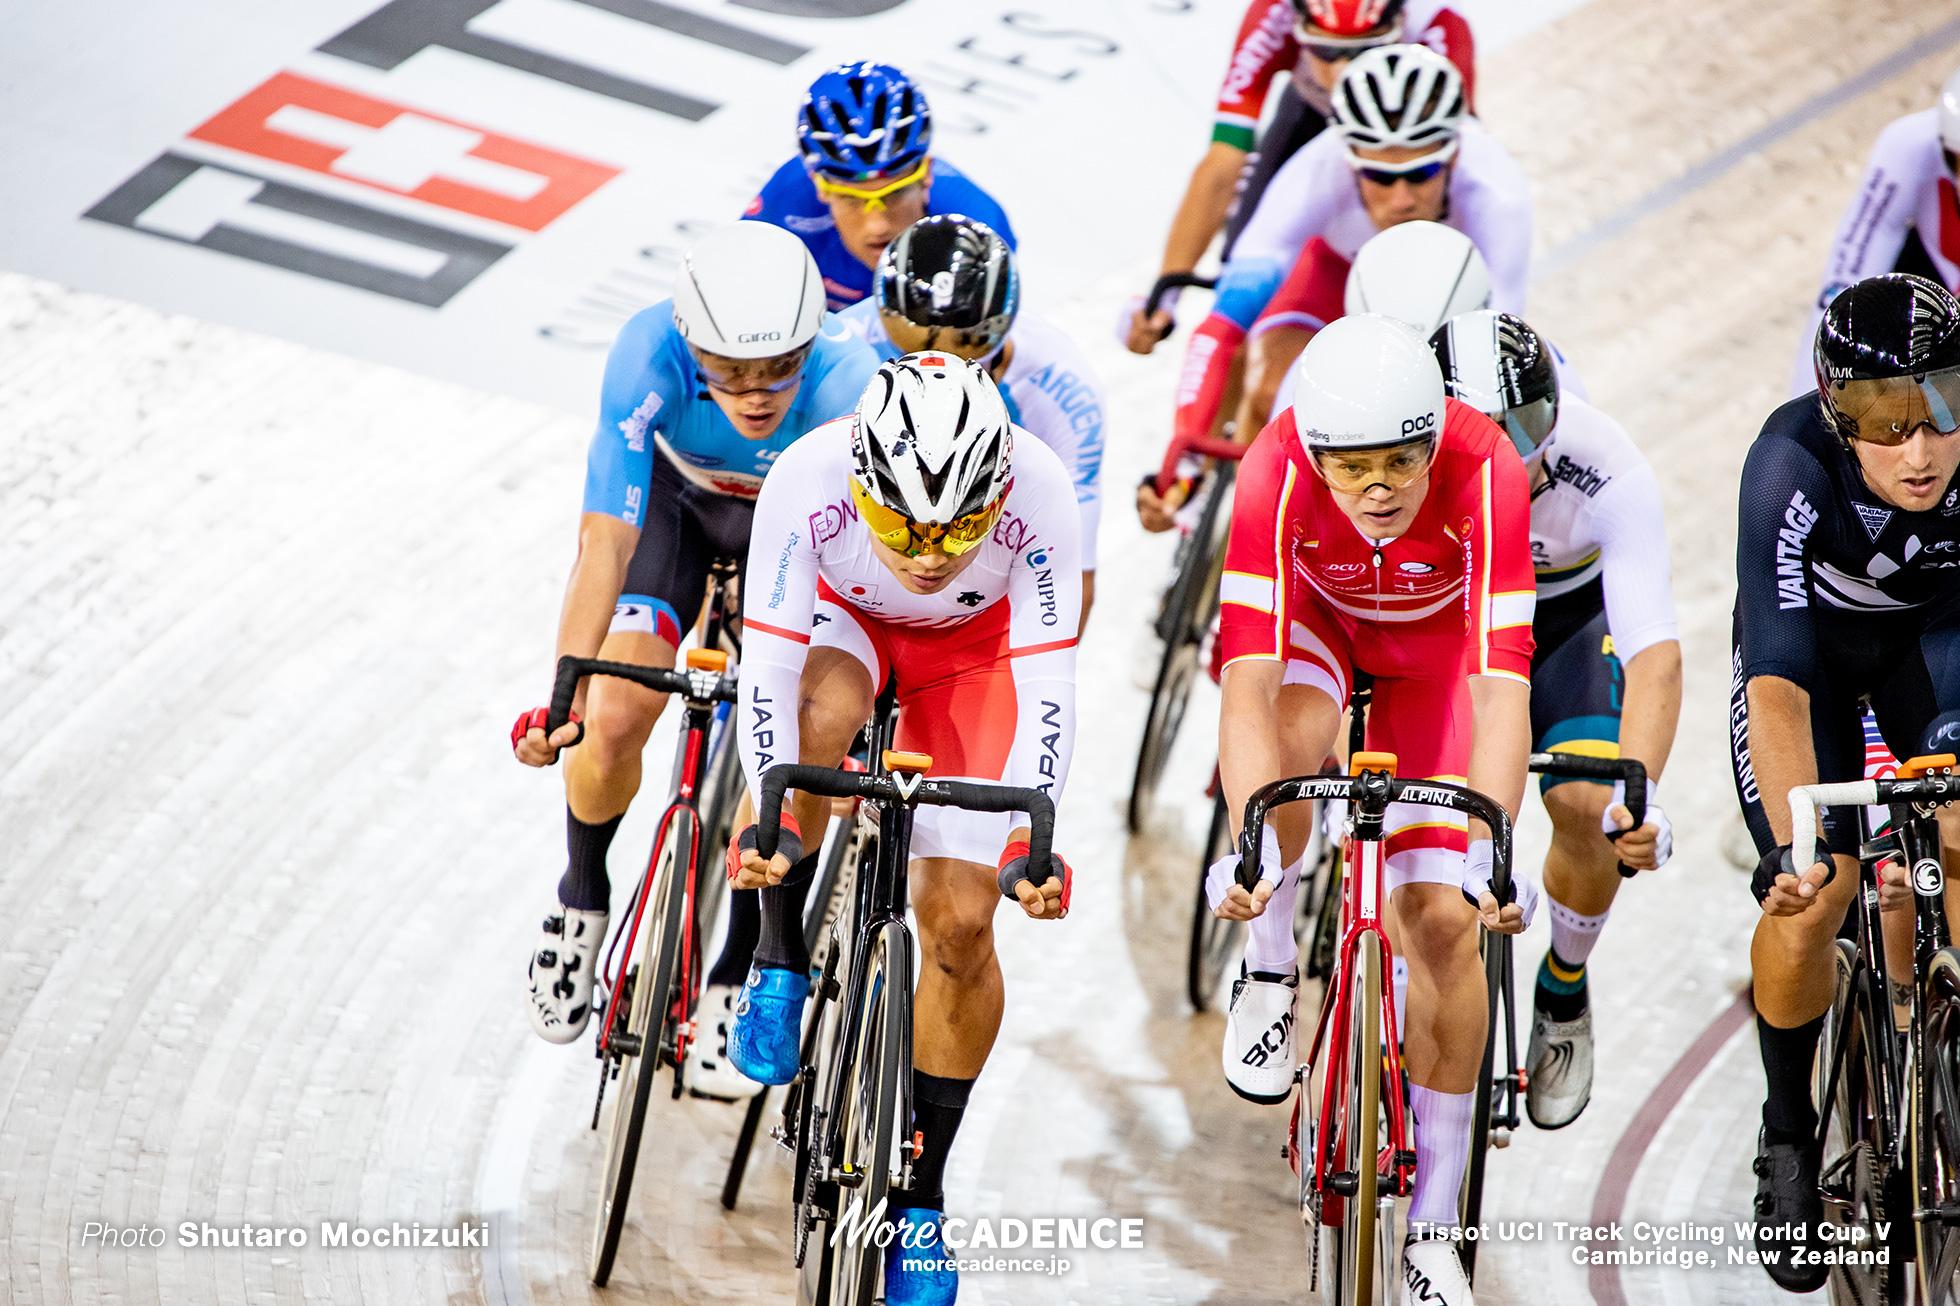 Elimination / Women's Omnium / Track Cycling World Cup V / Cambridge, New Zealand